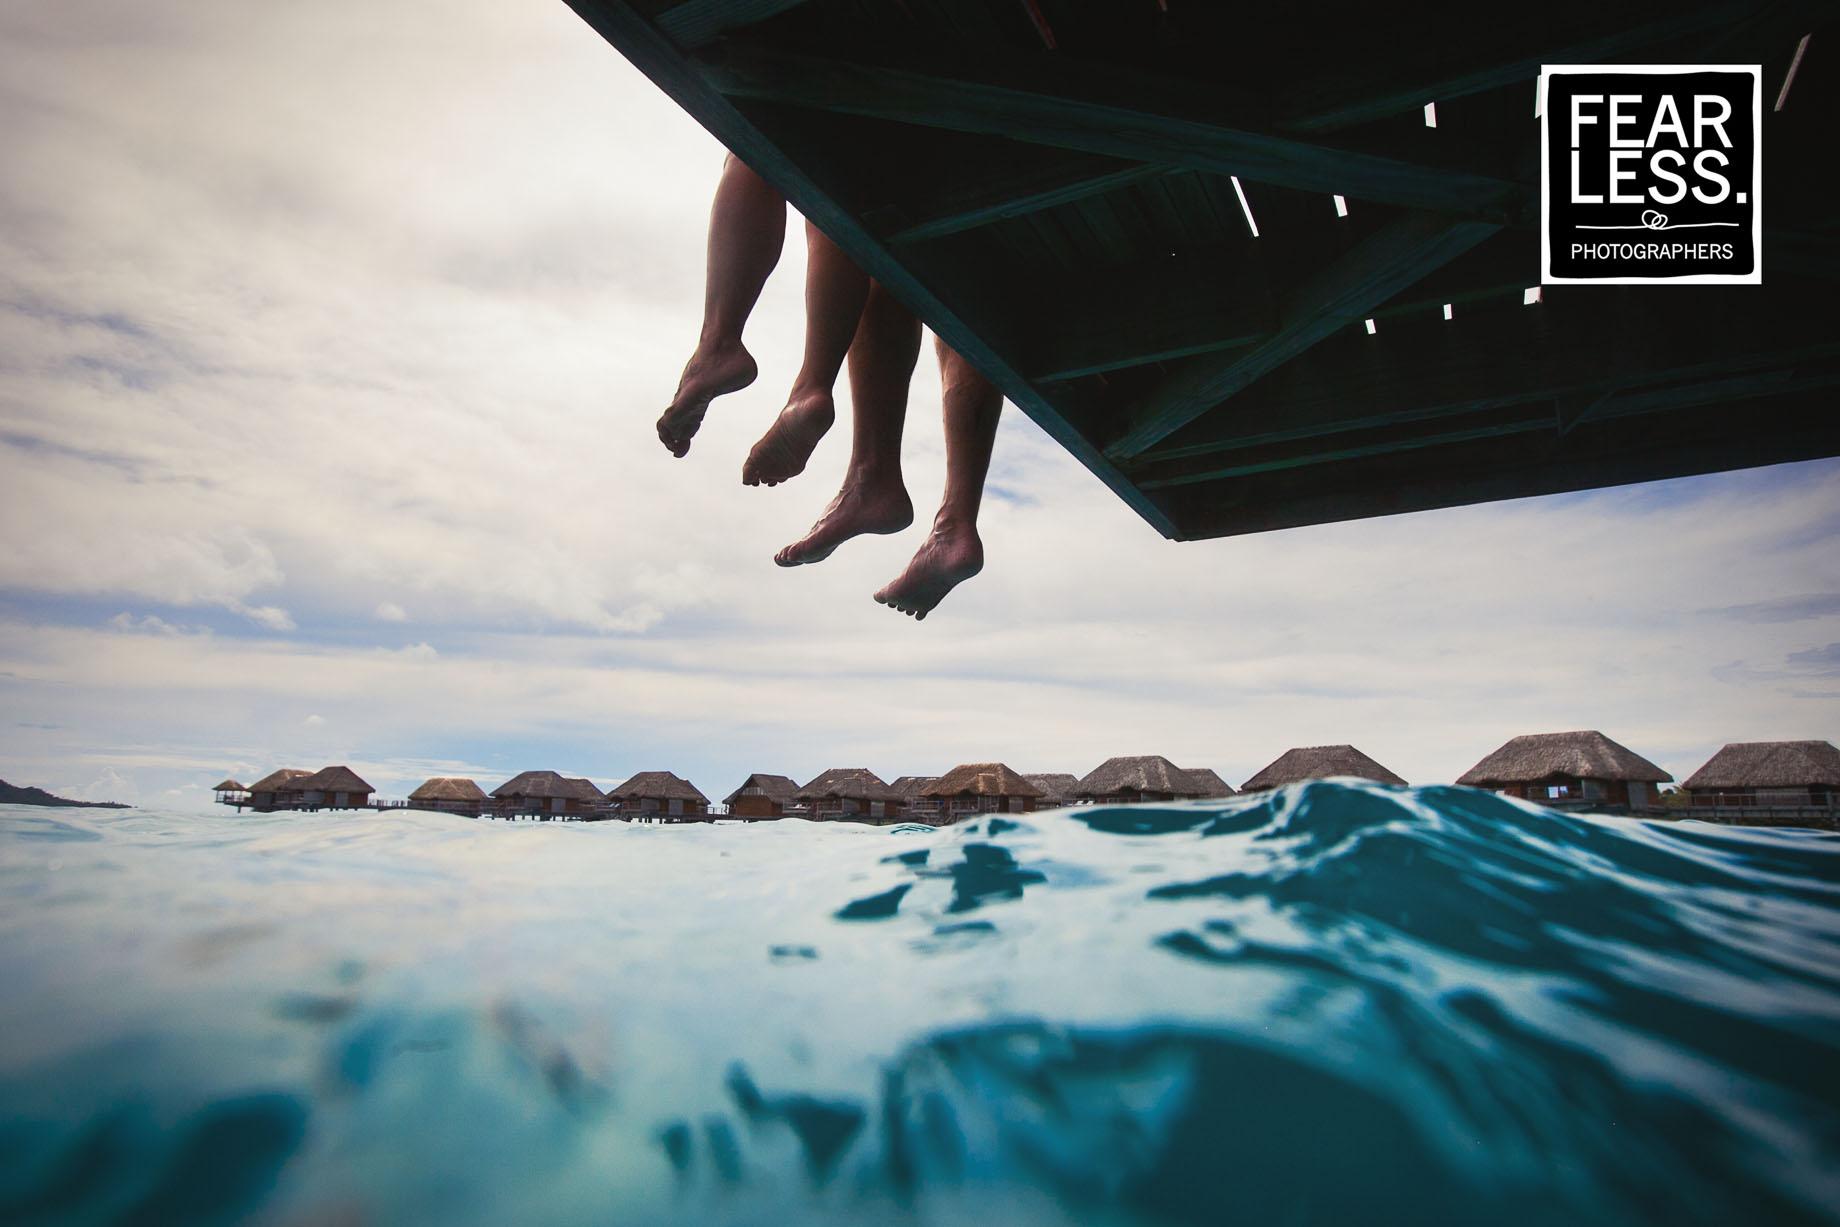 Brian Callaway - Fearless Photographer Award - Round 22